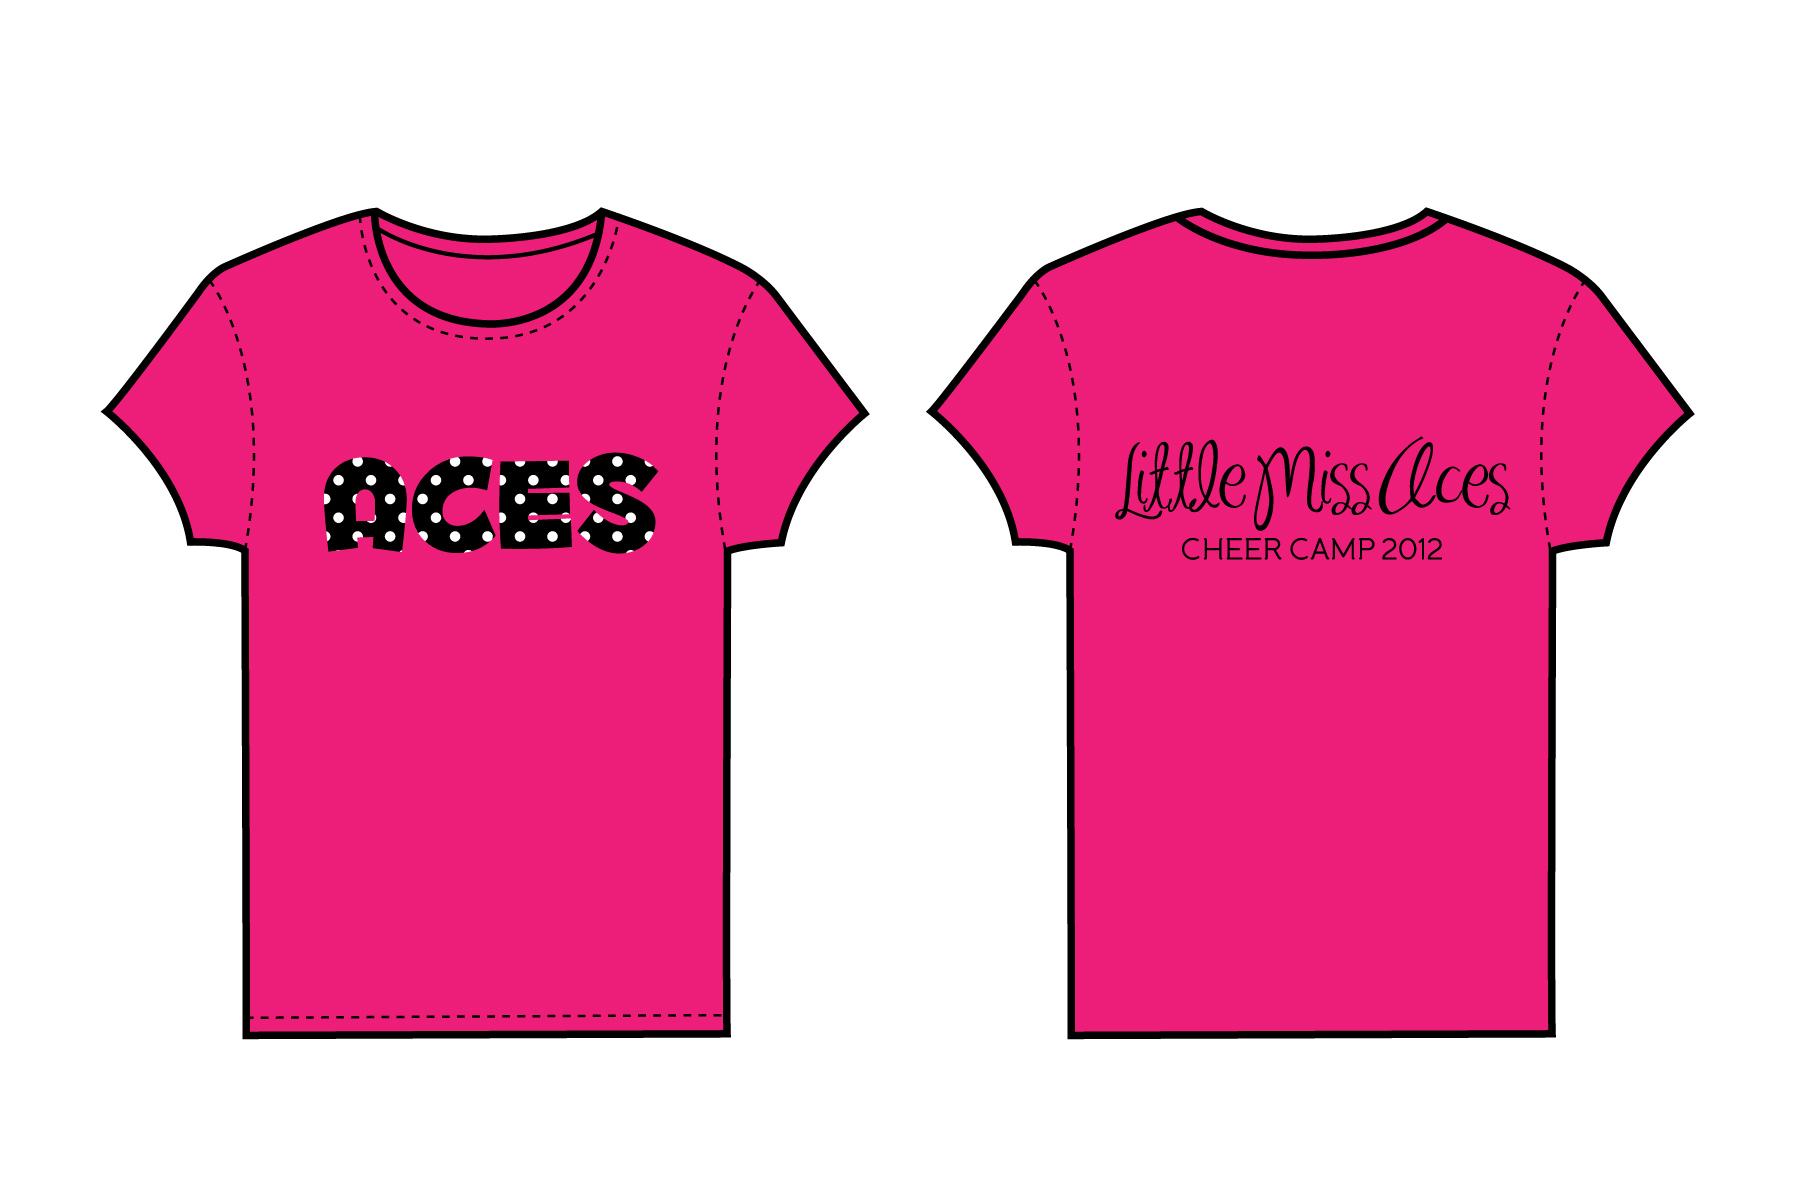 cheerleading shirt designs ideas aces cheer camp custom